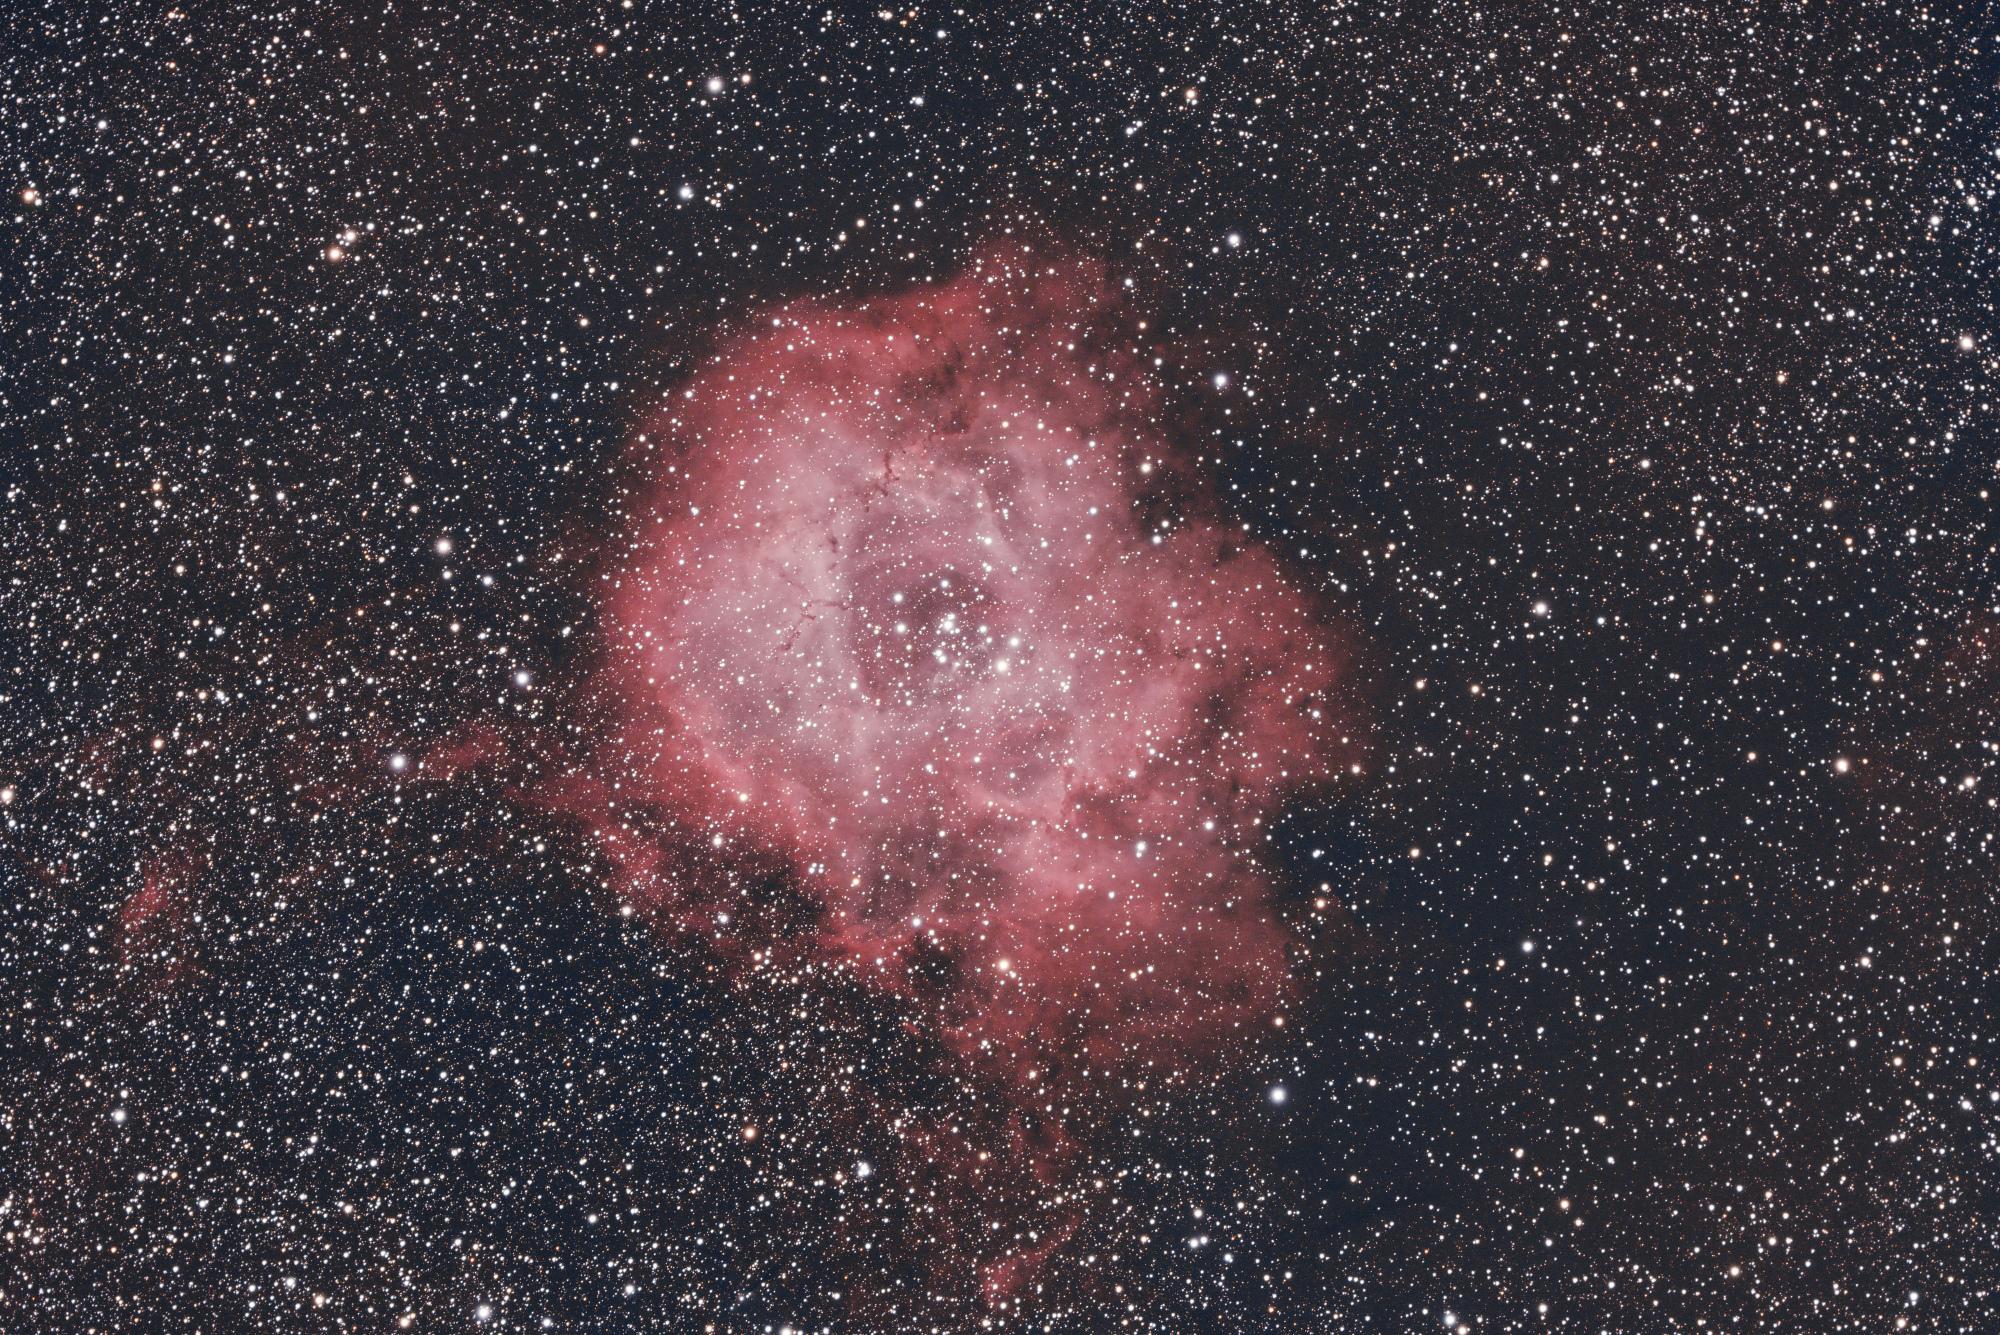 NGC2244_40x300s_55d_gain100_20210108_-20C_LP_PS.thumb.jpg.37efcc05a6d61cd32ae419b0ec13f414.jpg